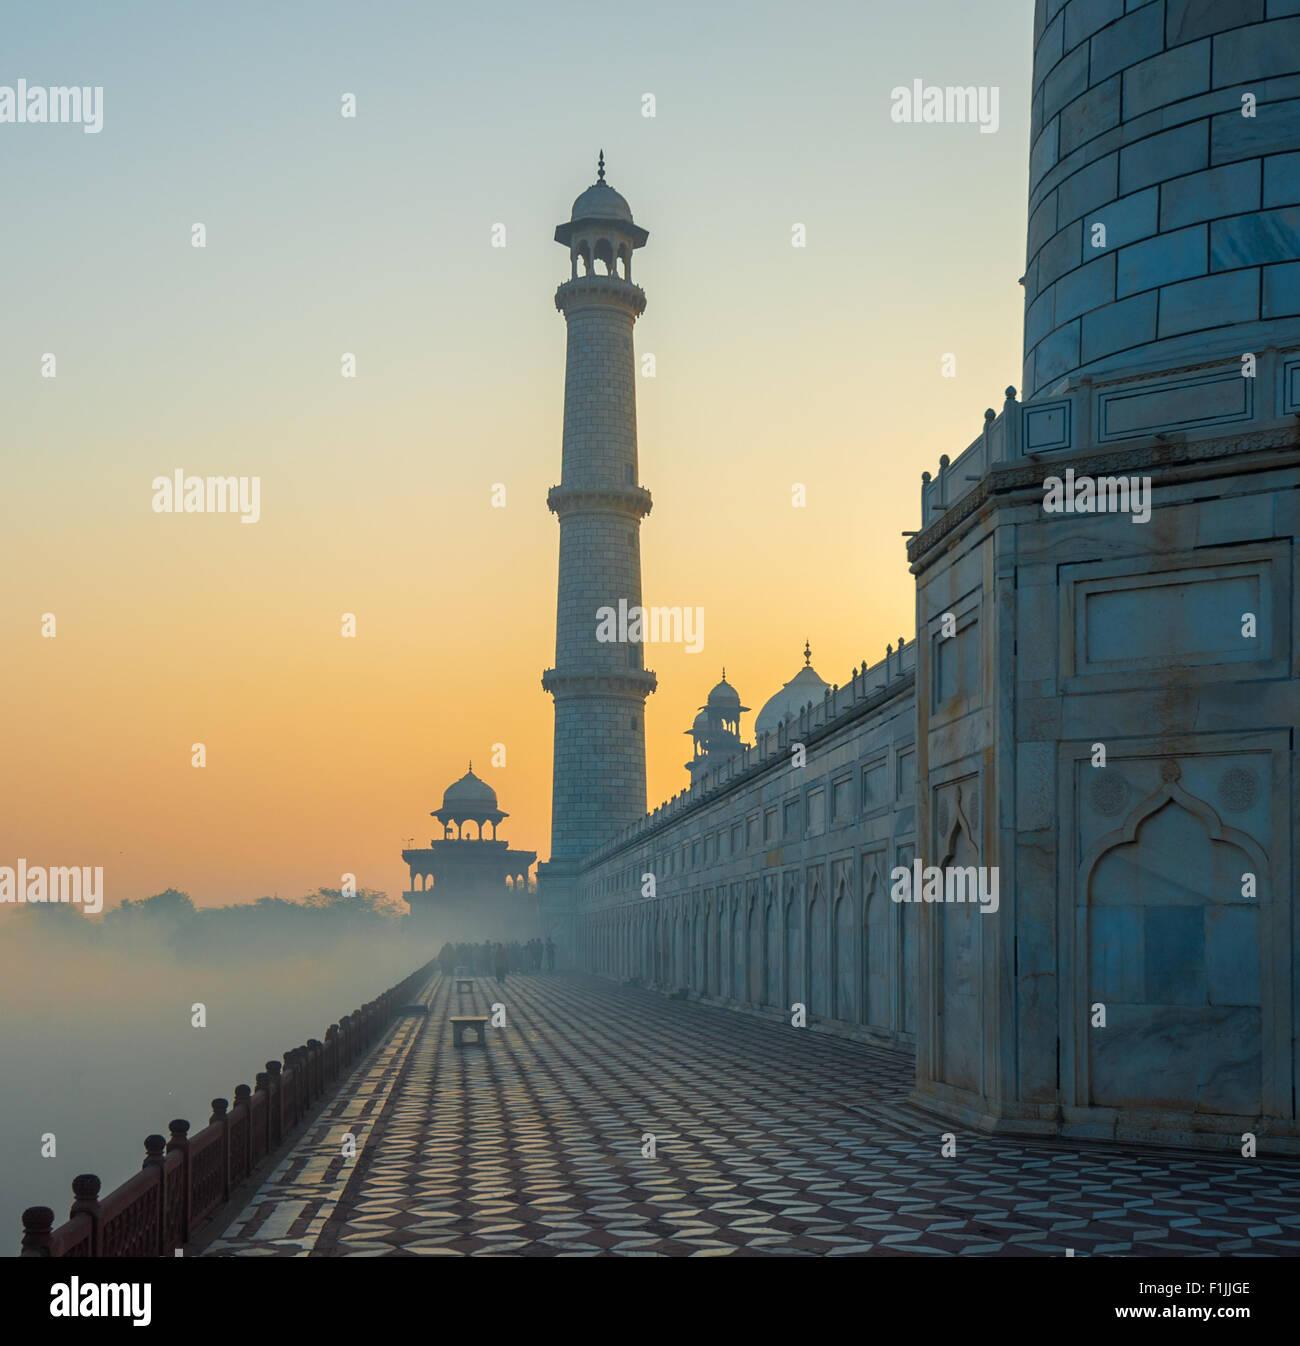 Taj Mahal au lever du soleil, Agra, Inde Photo Stock